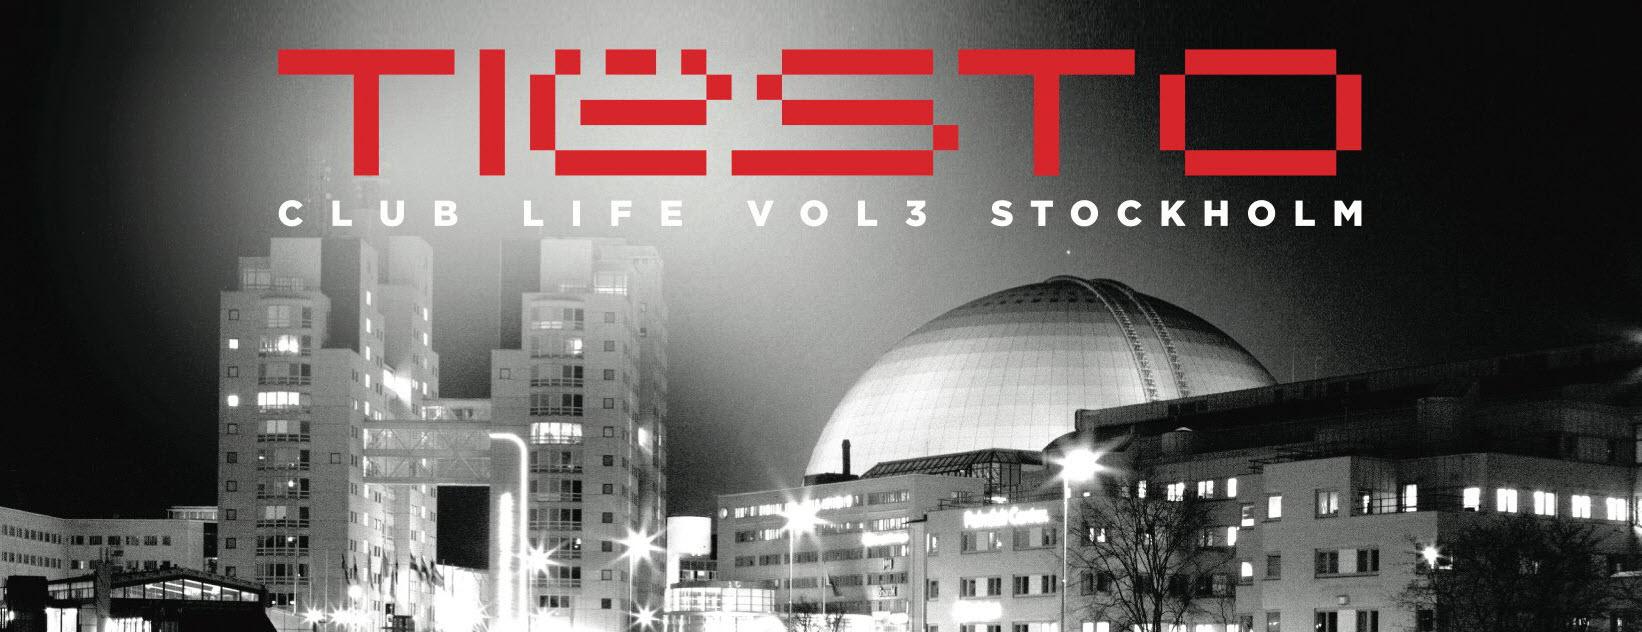 Tiesto's Club Life Volume 3 Stockholm Tracklist